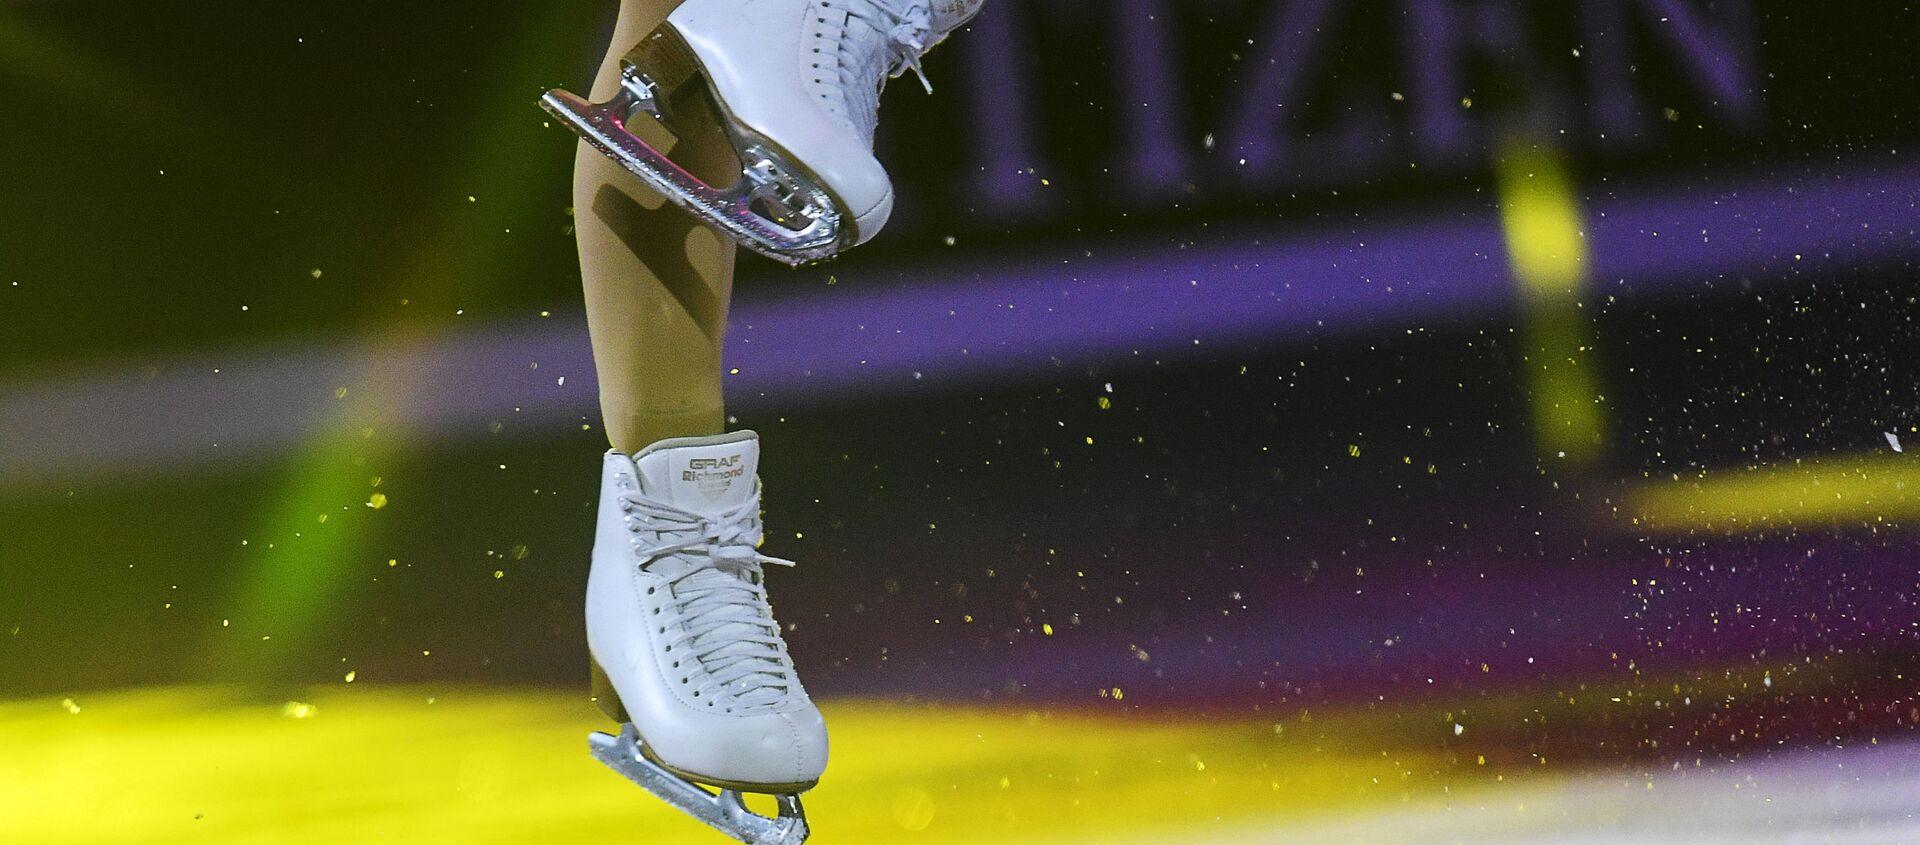 ISU、2022北京五輪フィギュアスケート競技審判員の抽選を行う - Sputnik 日本, 1920, 26.09.2021